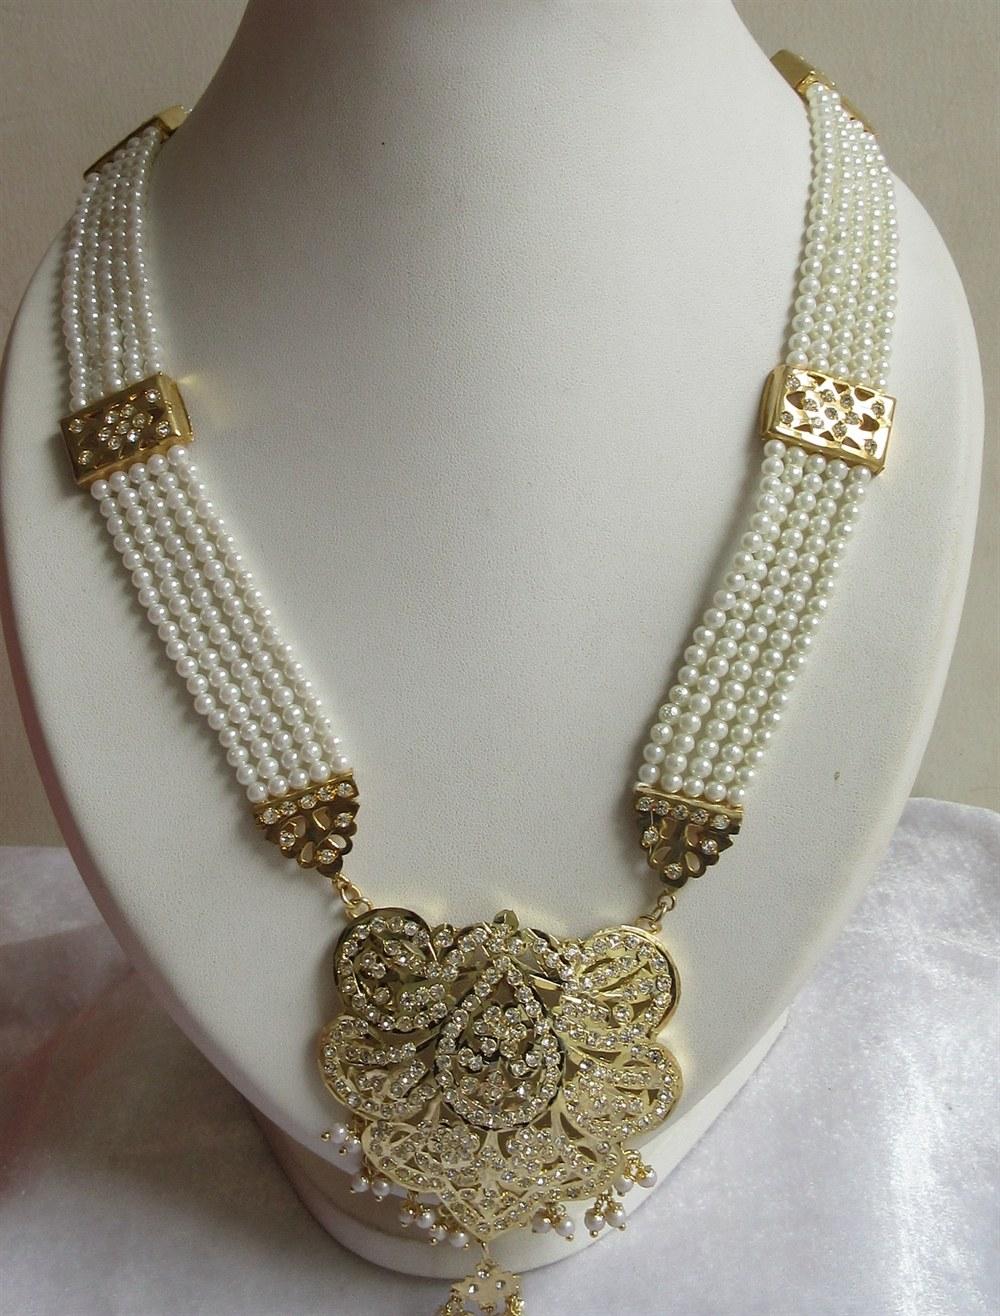 rani haar in emeralds with earrings 3 layer raani haar